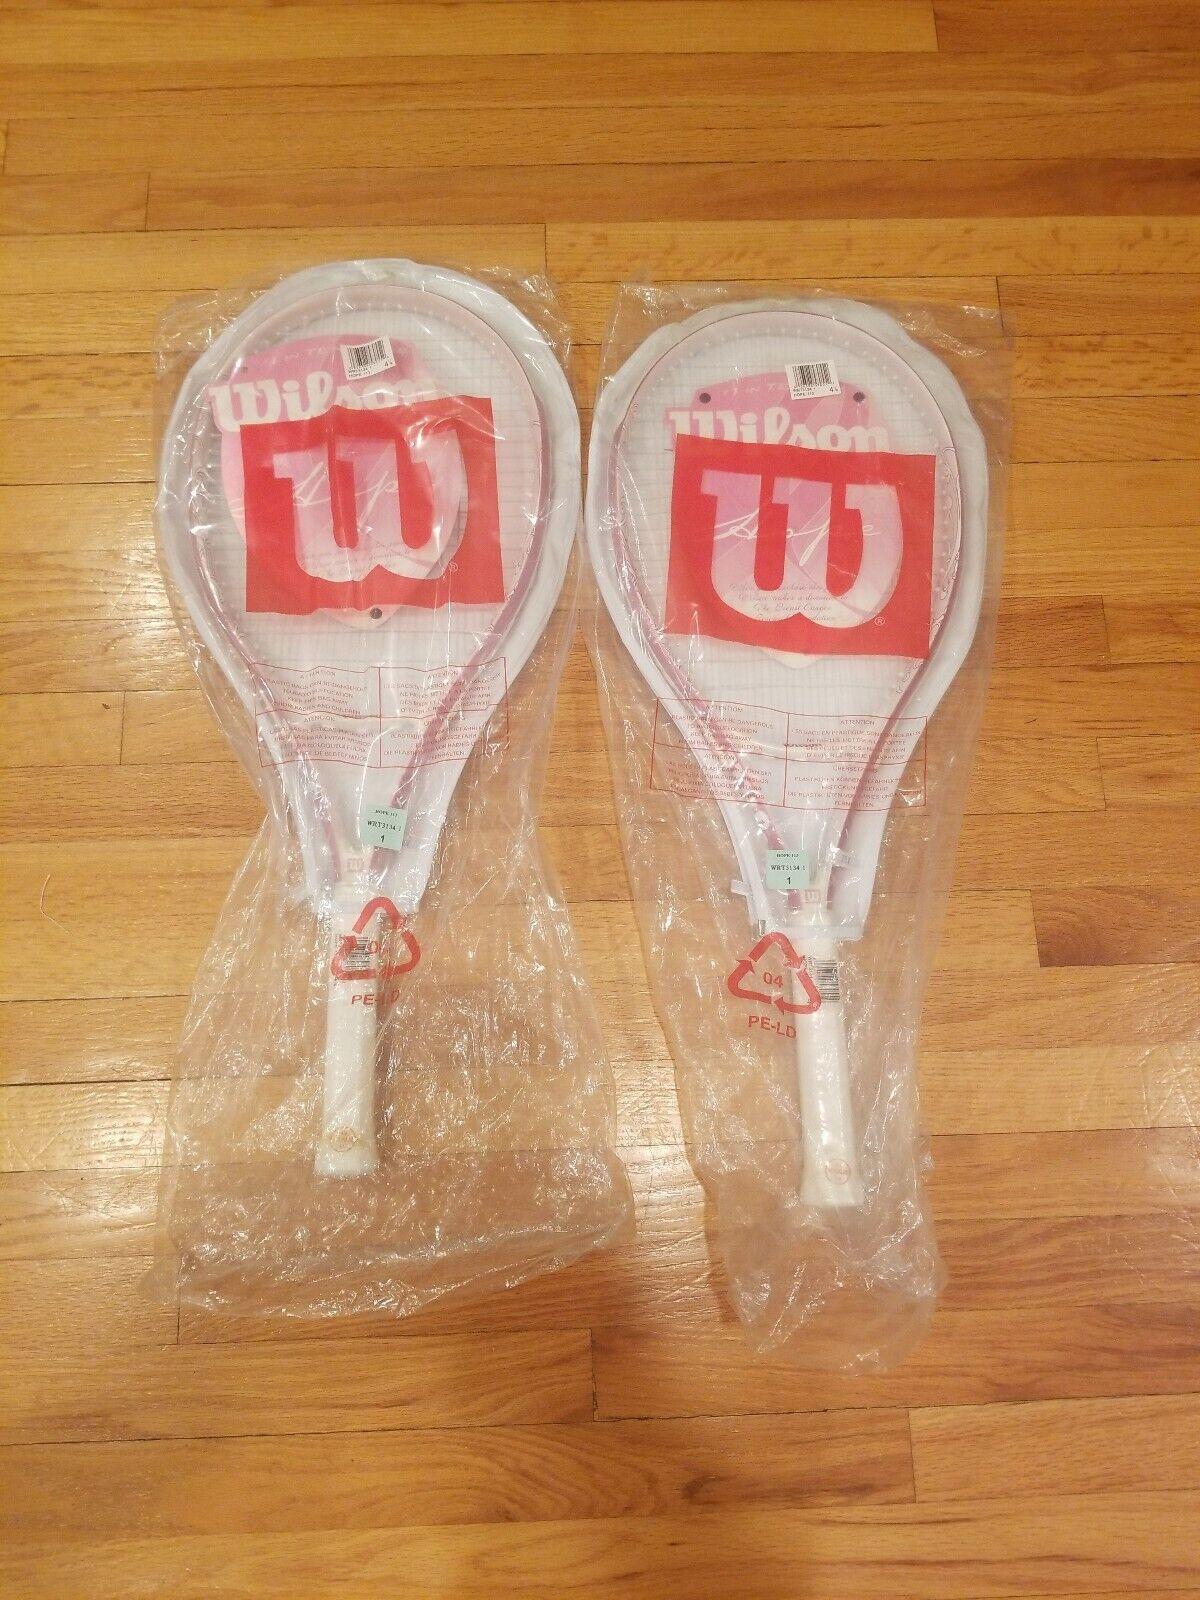 New Wilson Hope Pink 113 sq.in. Tennis Racquet 4 1 8  Grip L1 -Lot of 2